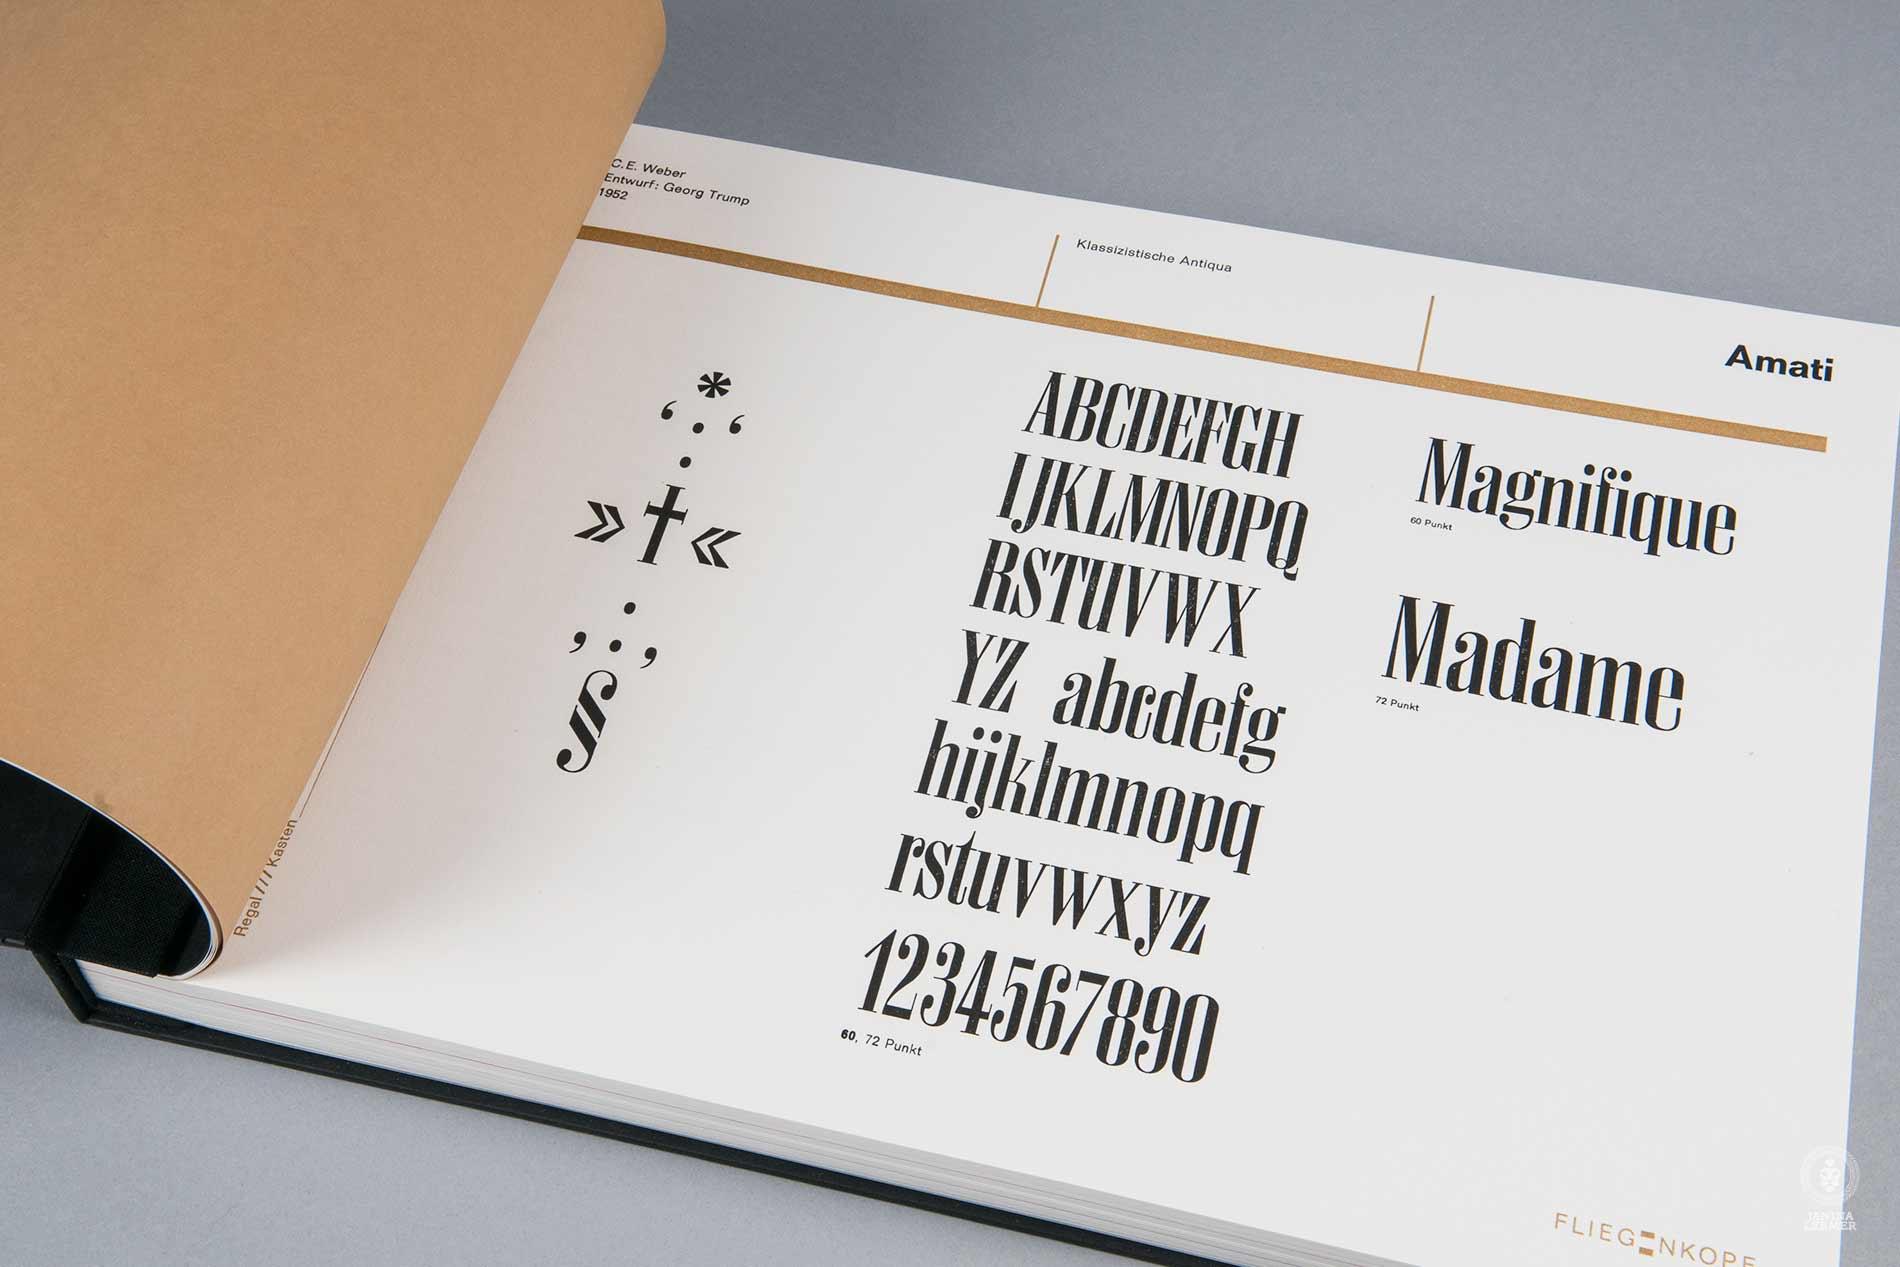 Janina-Lermer-Buchgestaltung-Magazingestaltung-Editorialdesign-Bleisatz-Metaltype-Klassizistische-Antiqua-Handgedruckt-Handprinted-Werkstatt-Fliegenkopf